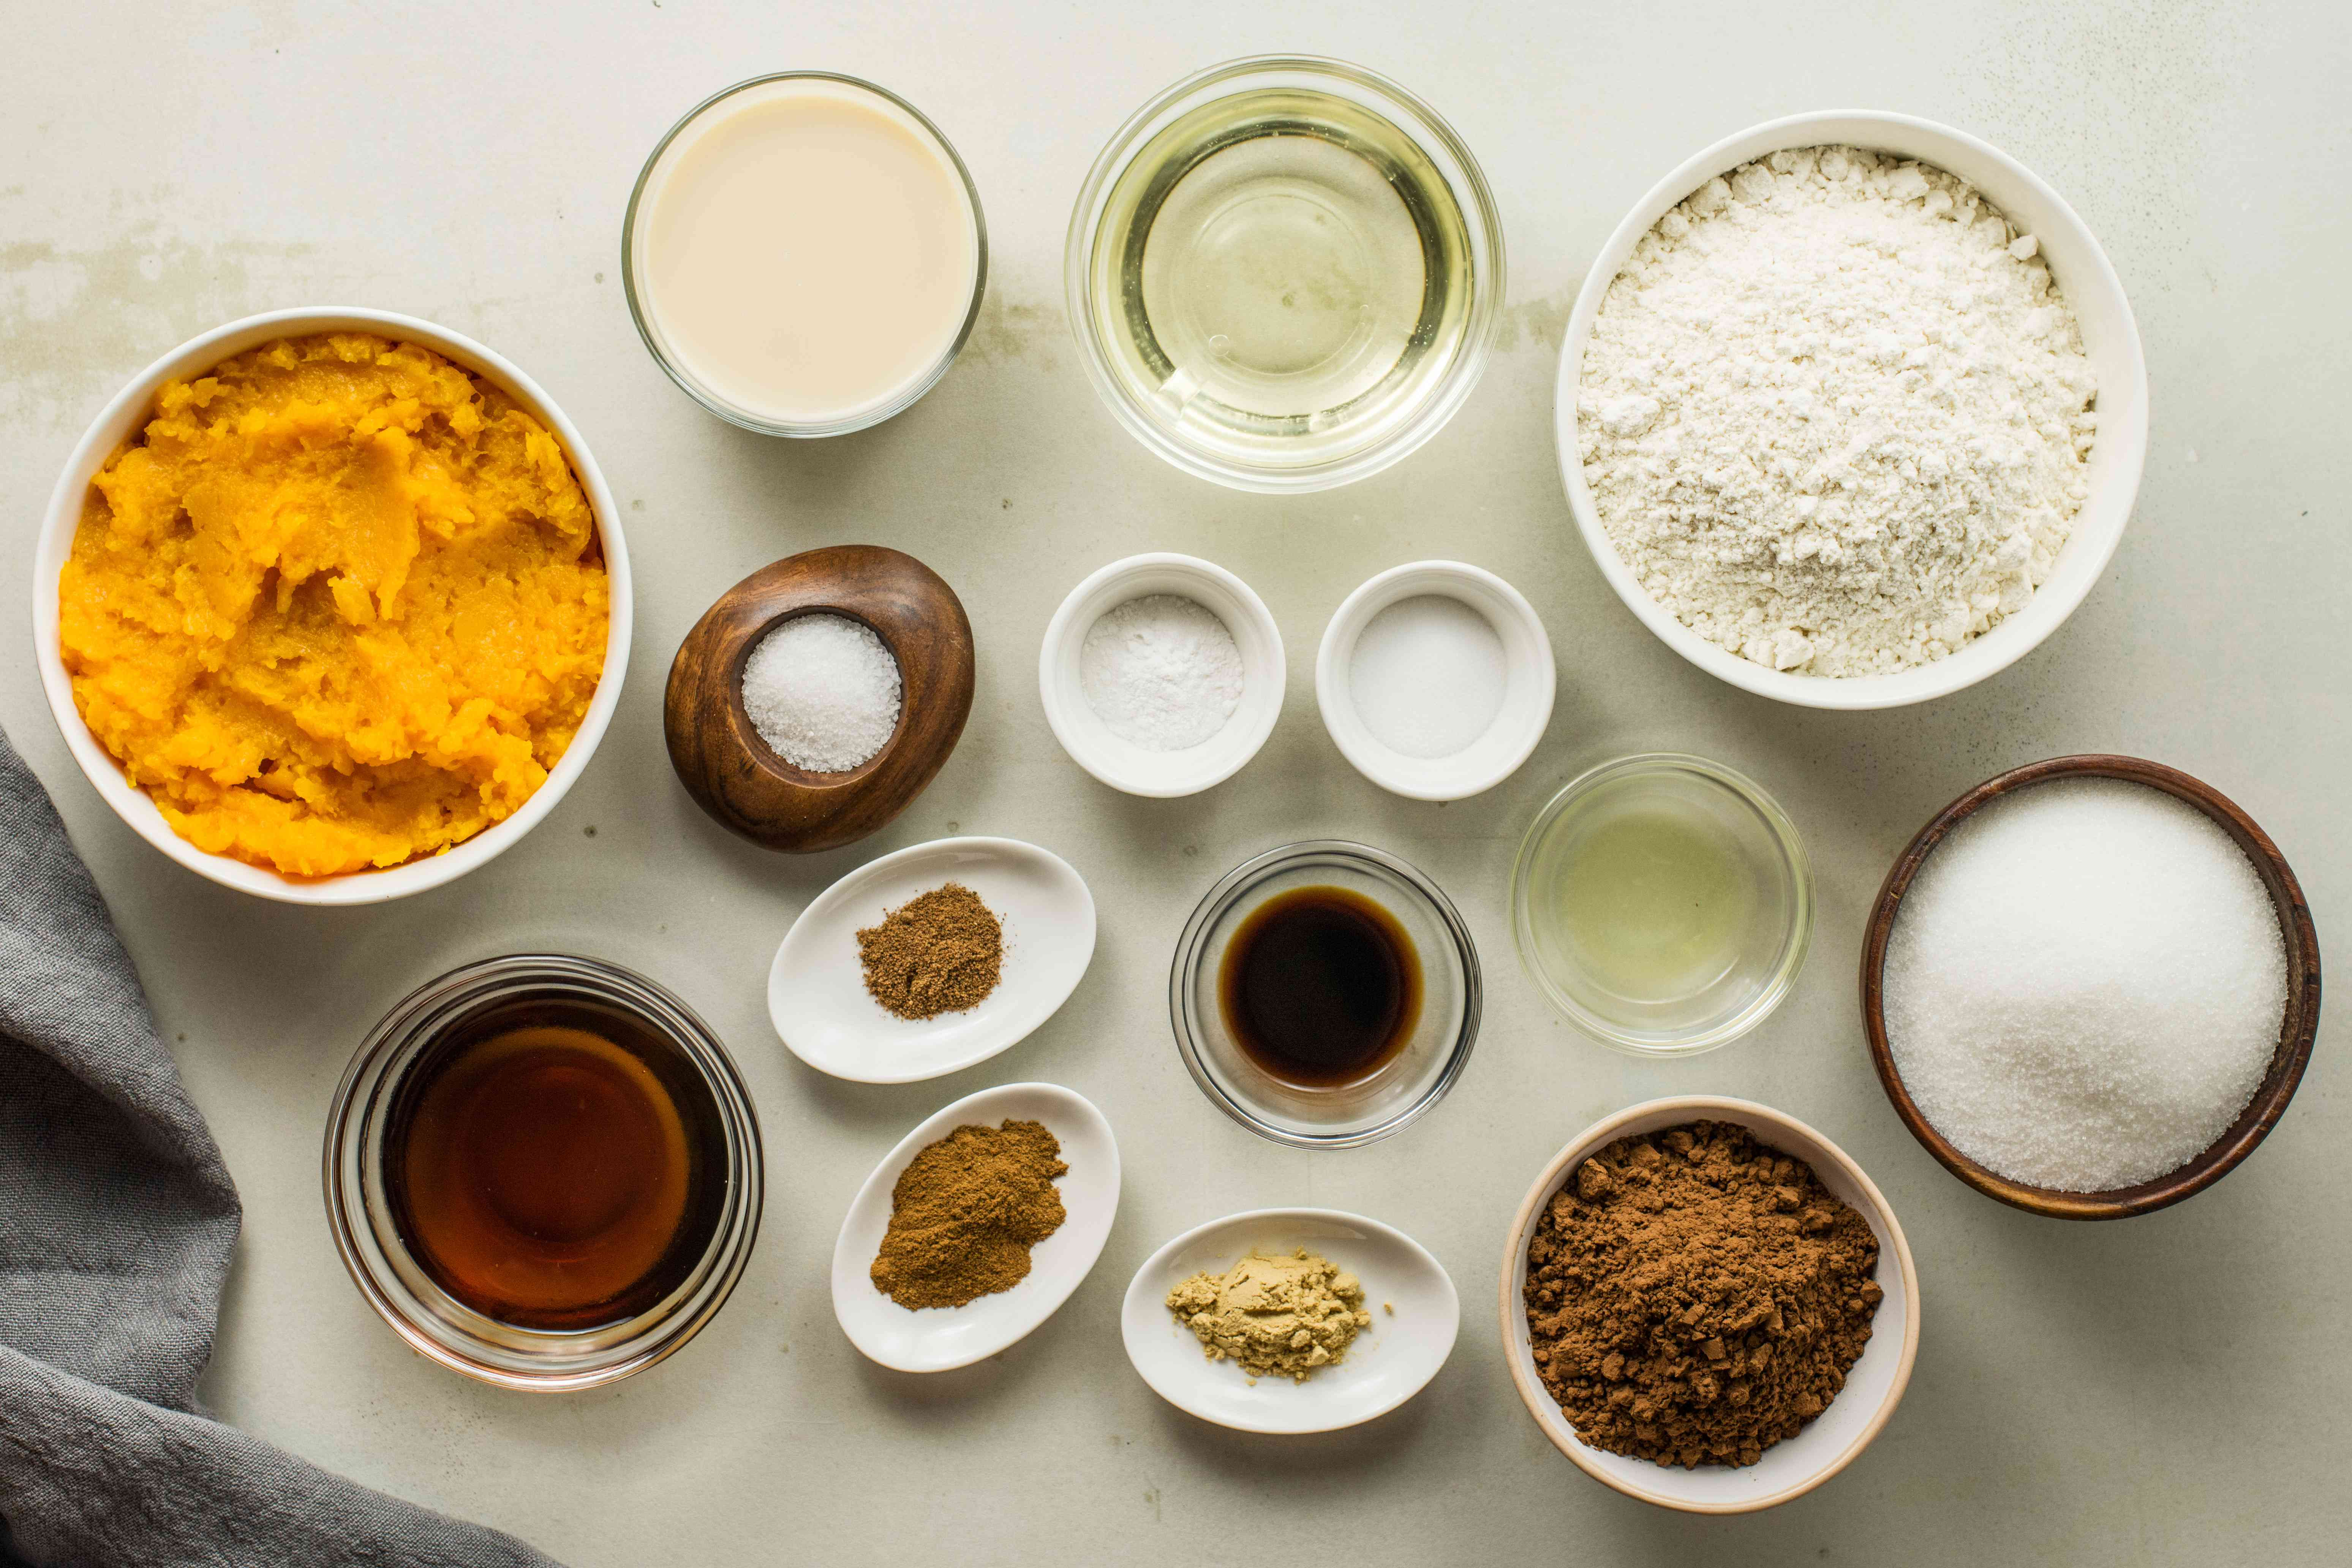 Ingredients for vegan chocolate pumpkin cake